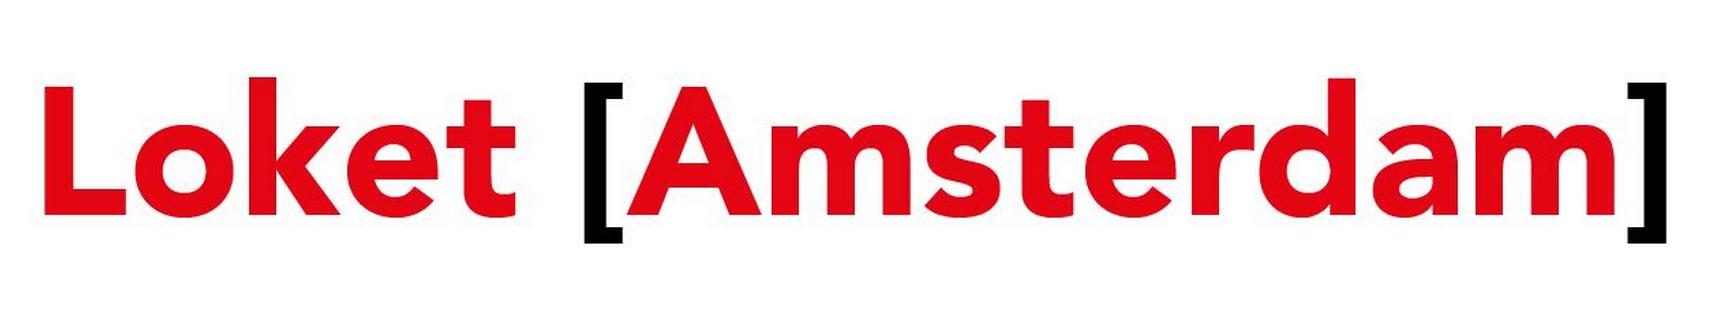 Loket Amsterdam